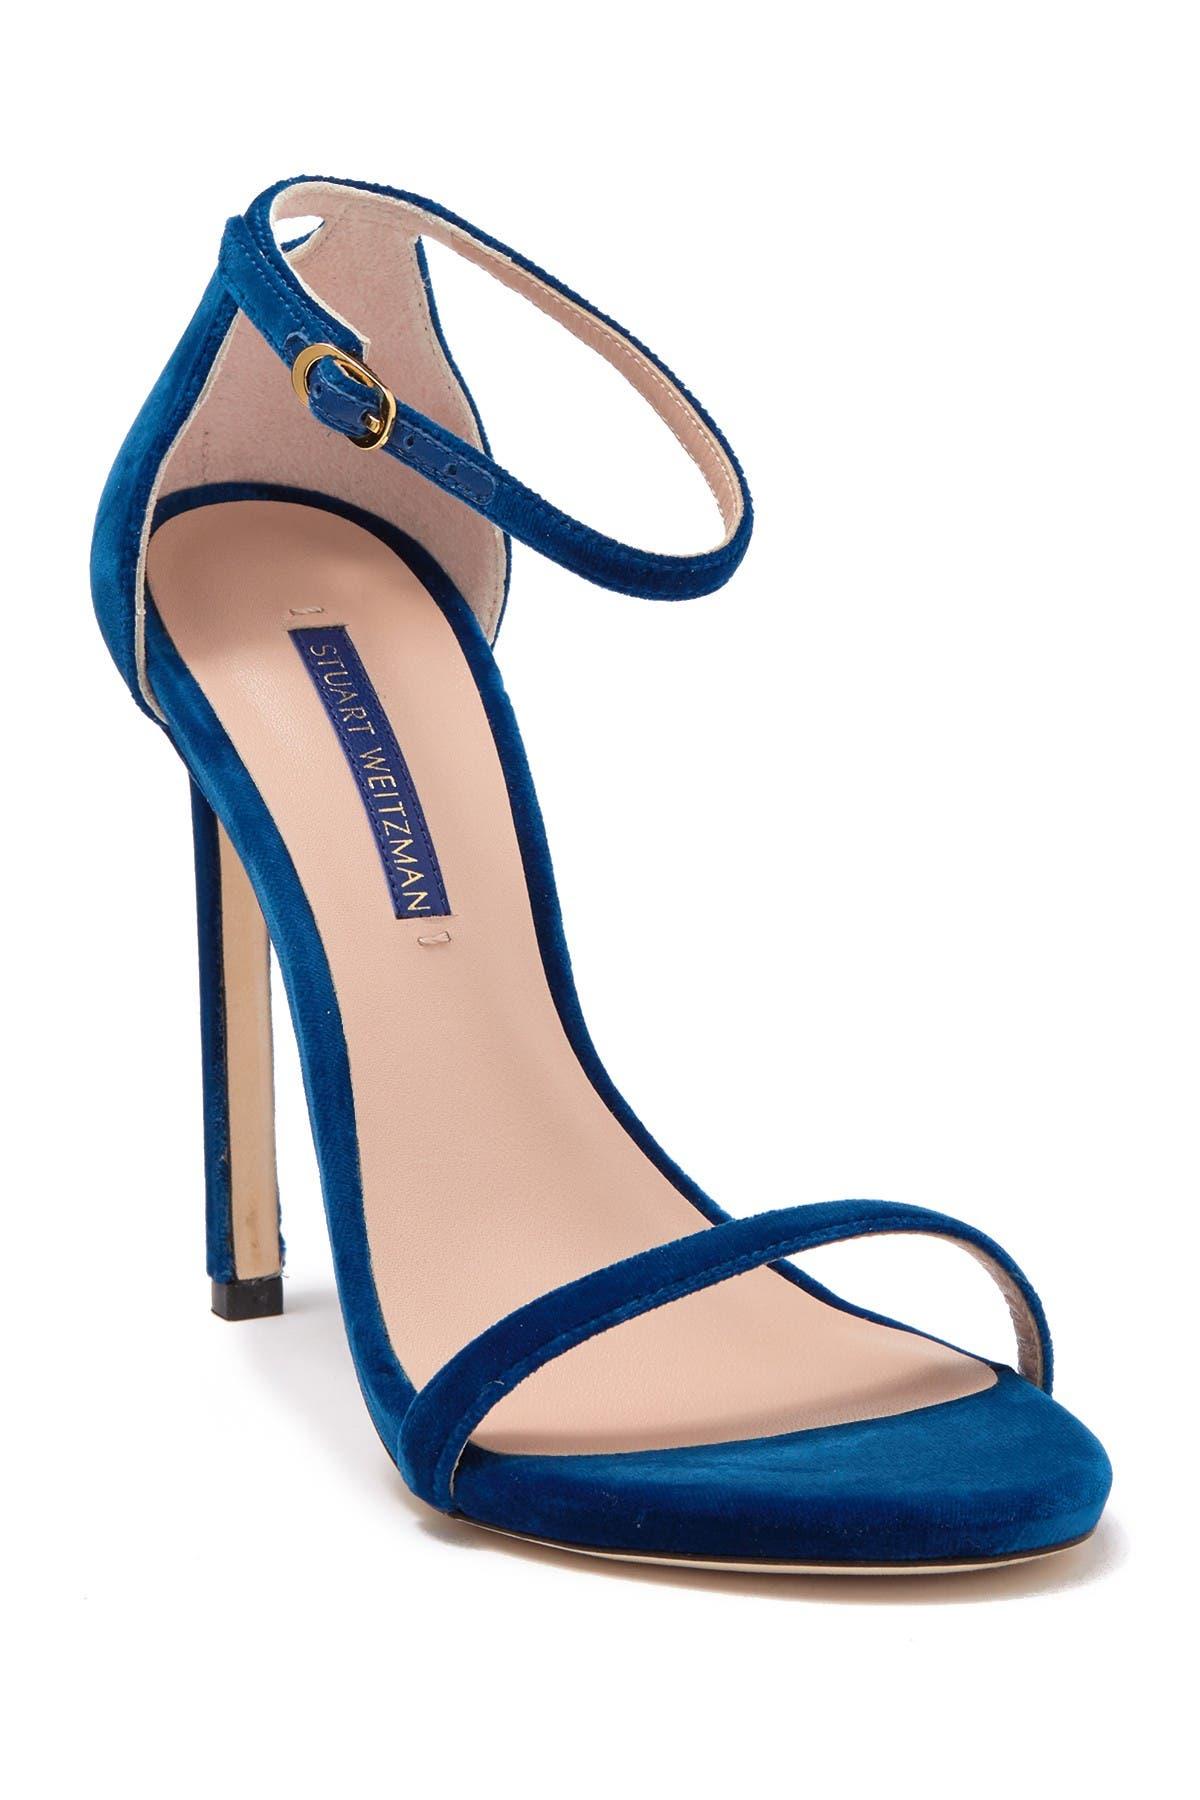 Image of Stuart Weitzman Nudist Stiletto Ankle Strap Sandal